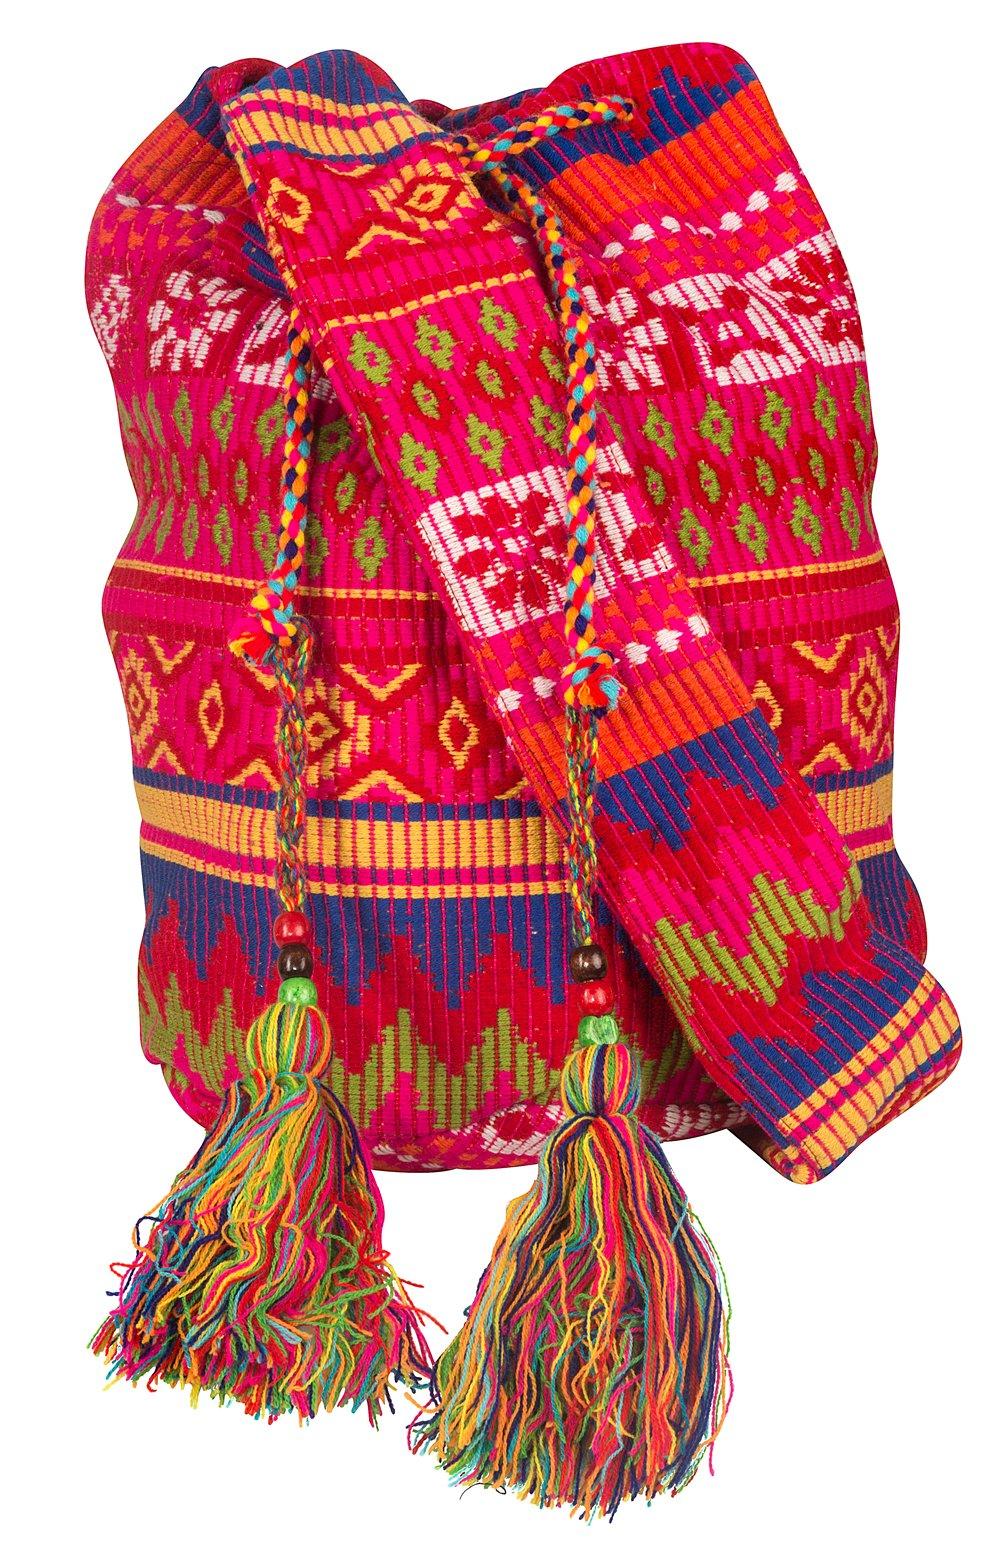 Tribe Azure Oversize Pink Hobo Shoulder Bag Crossbody Beach Shopping Market Casual Hippie Sling Messenger